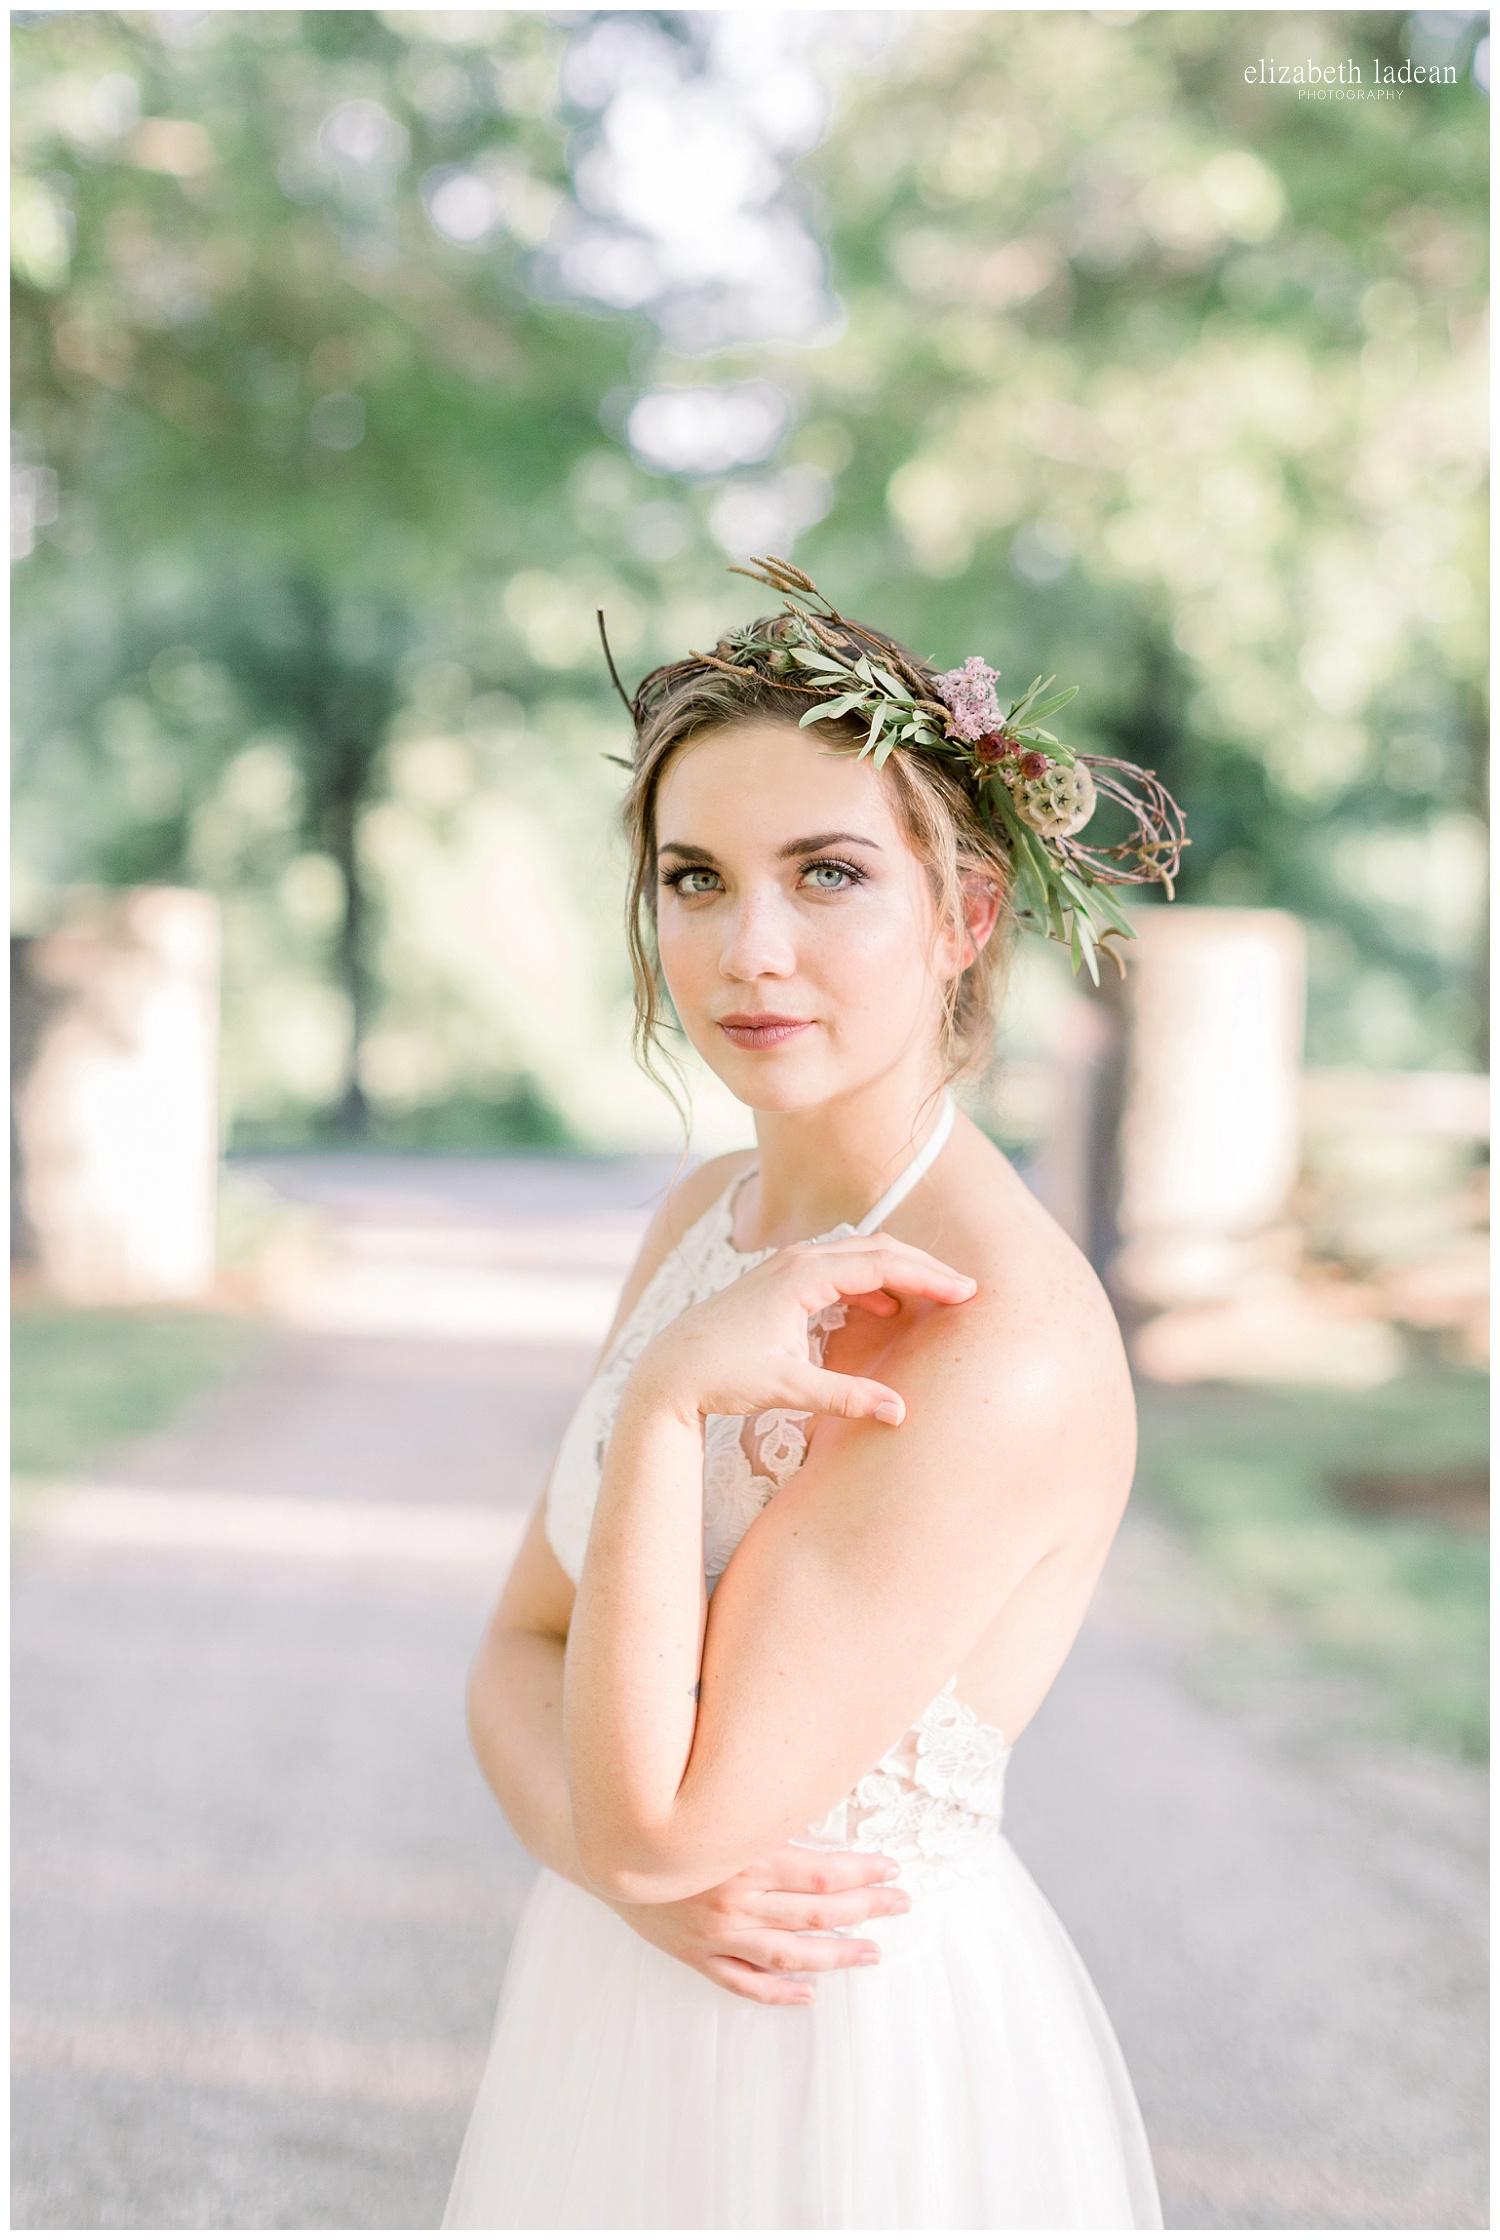 Modern-Woodland-Style-Wedding-Barn-at-Riverbend-June2018-elizabeth-ladean-photography-photo-_9191.jpg